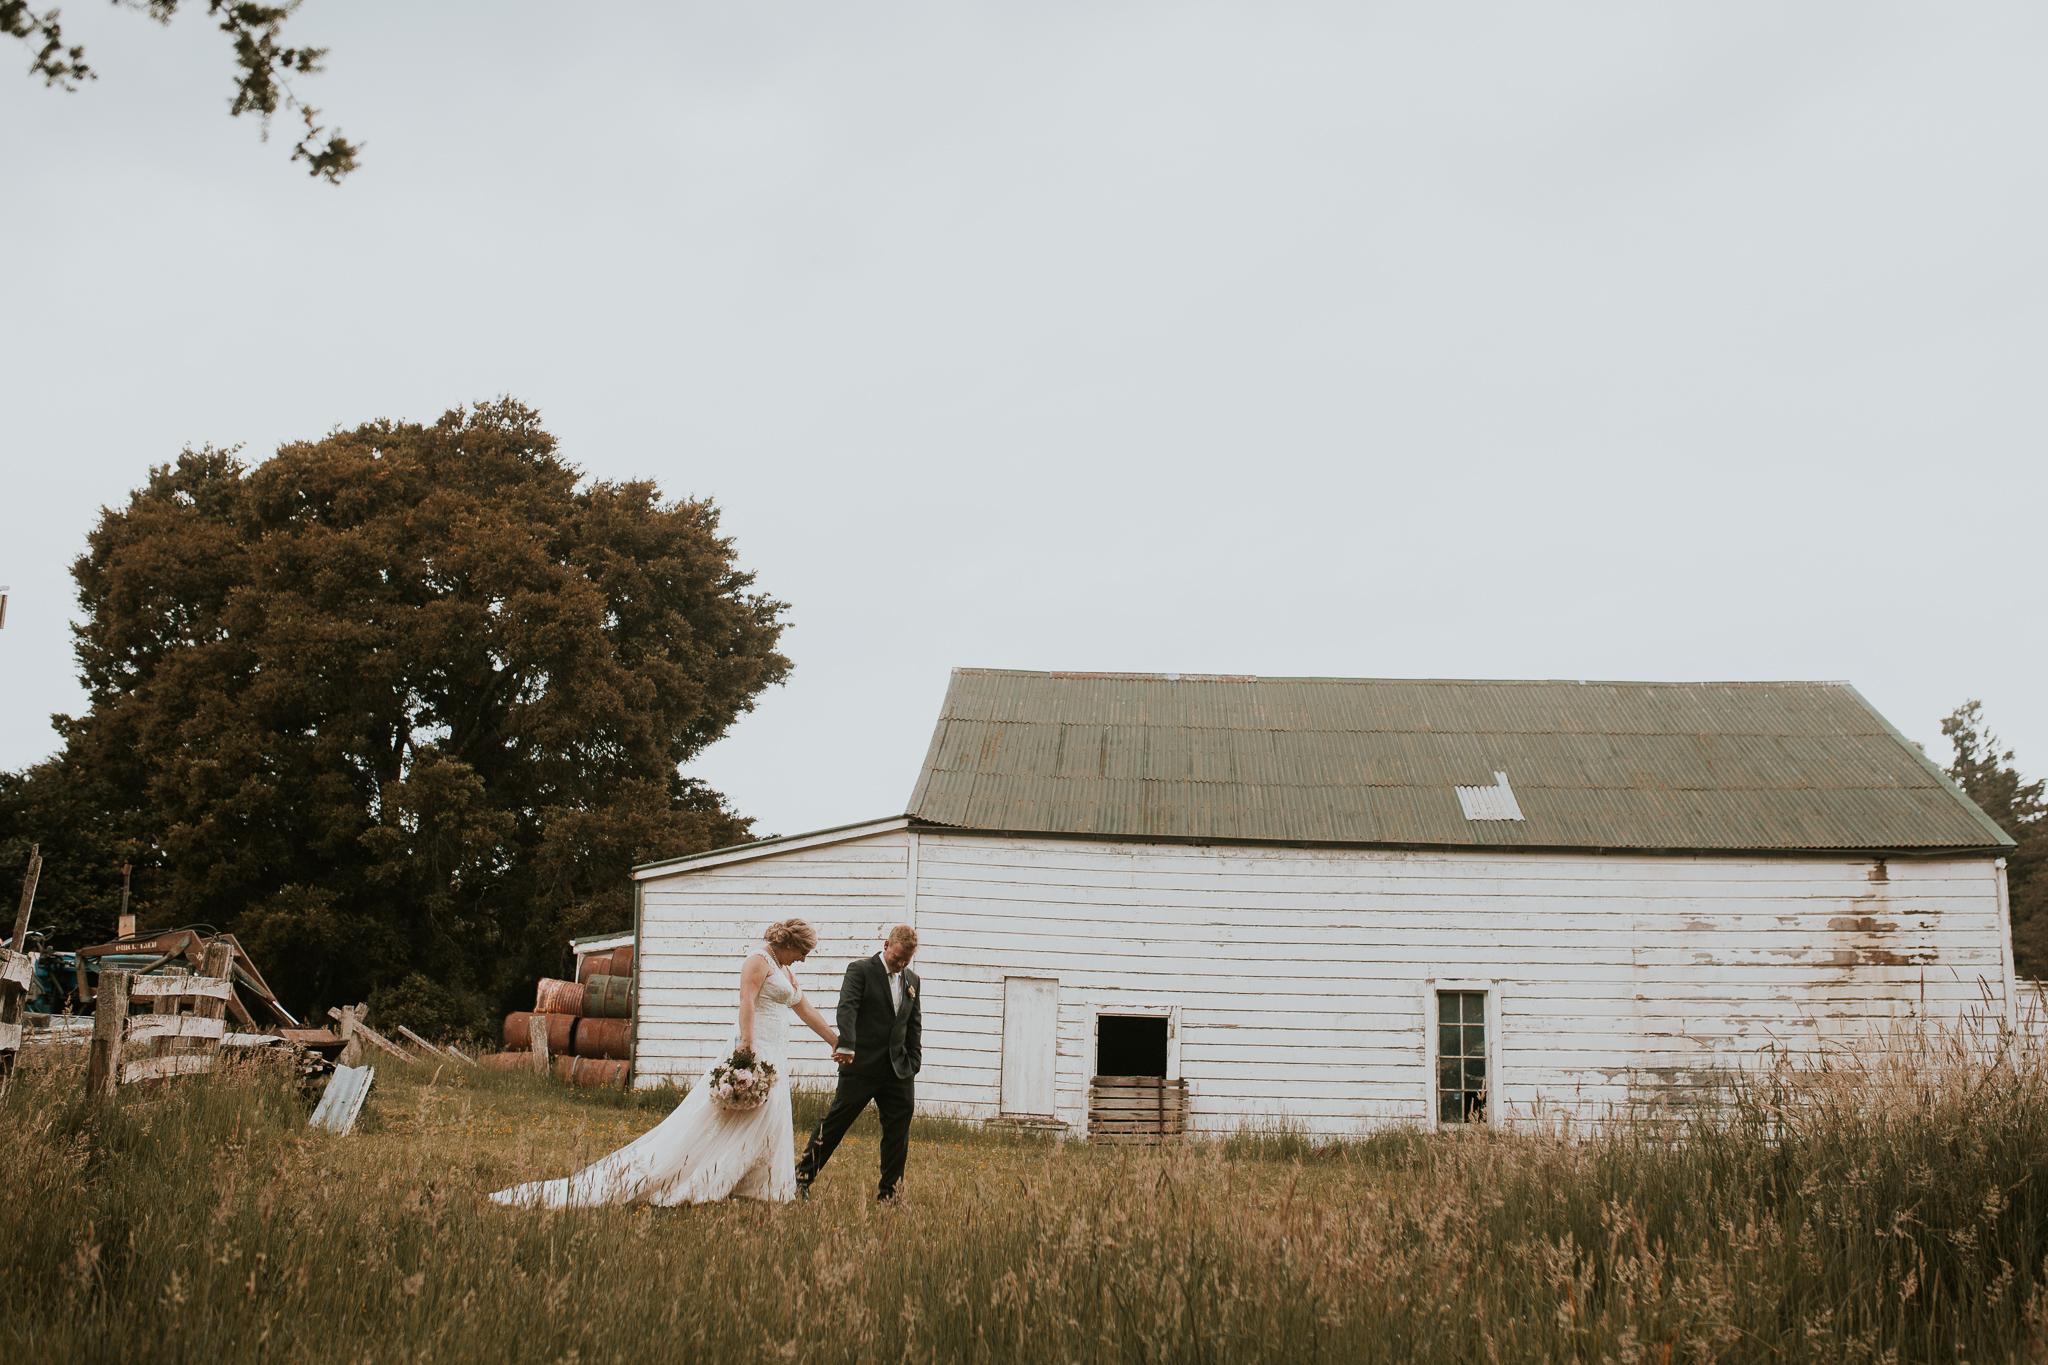 Lisa Fisher Photography gwavas homestead hawkebay-18.jpg